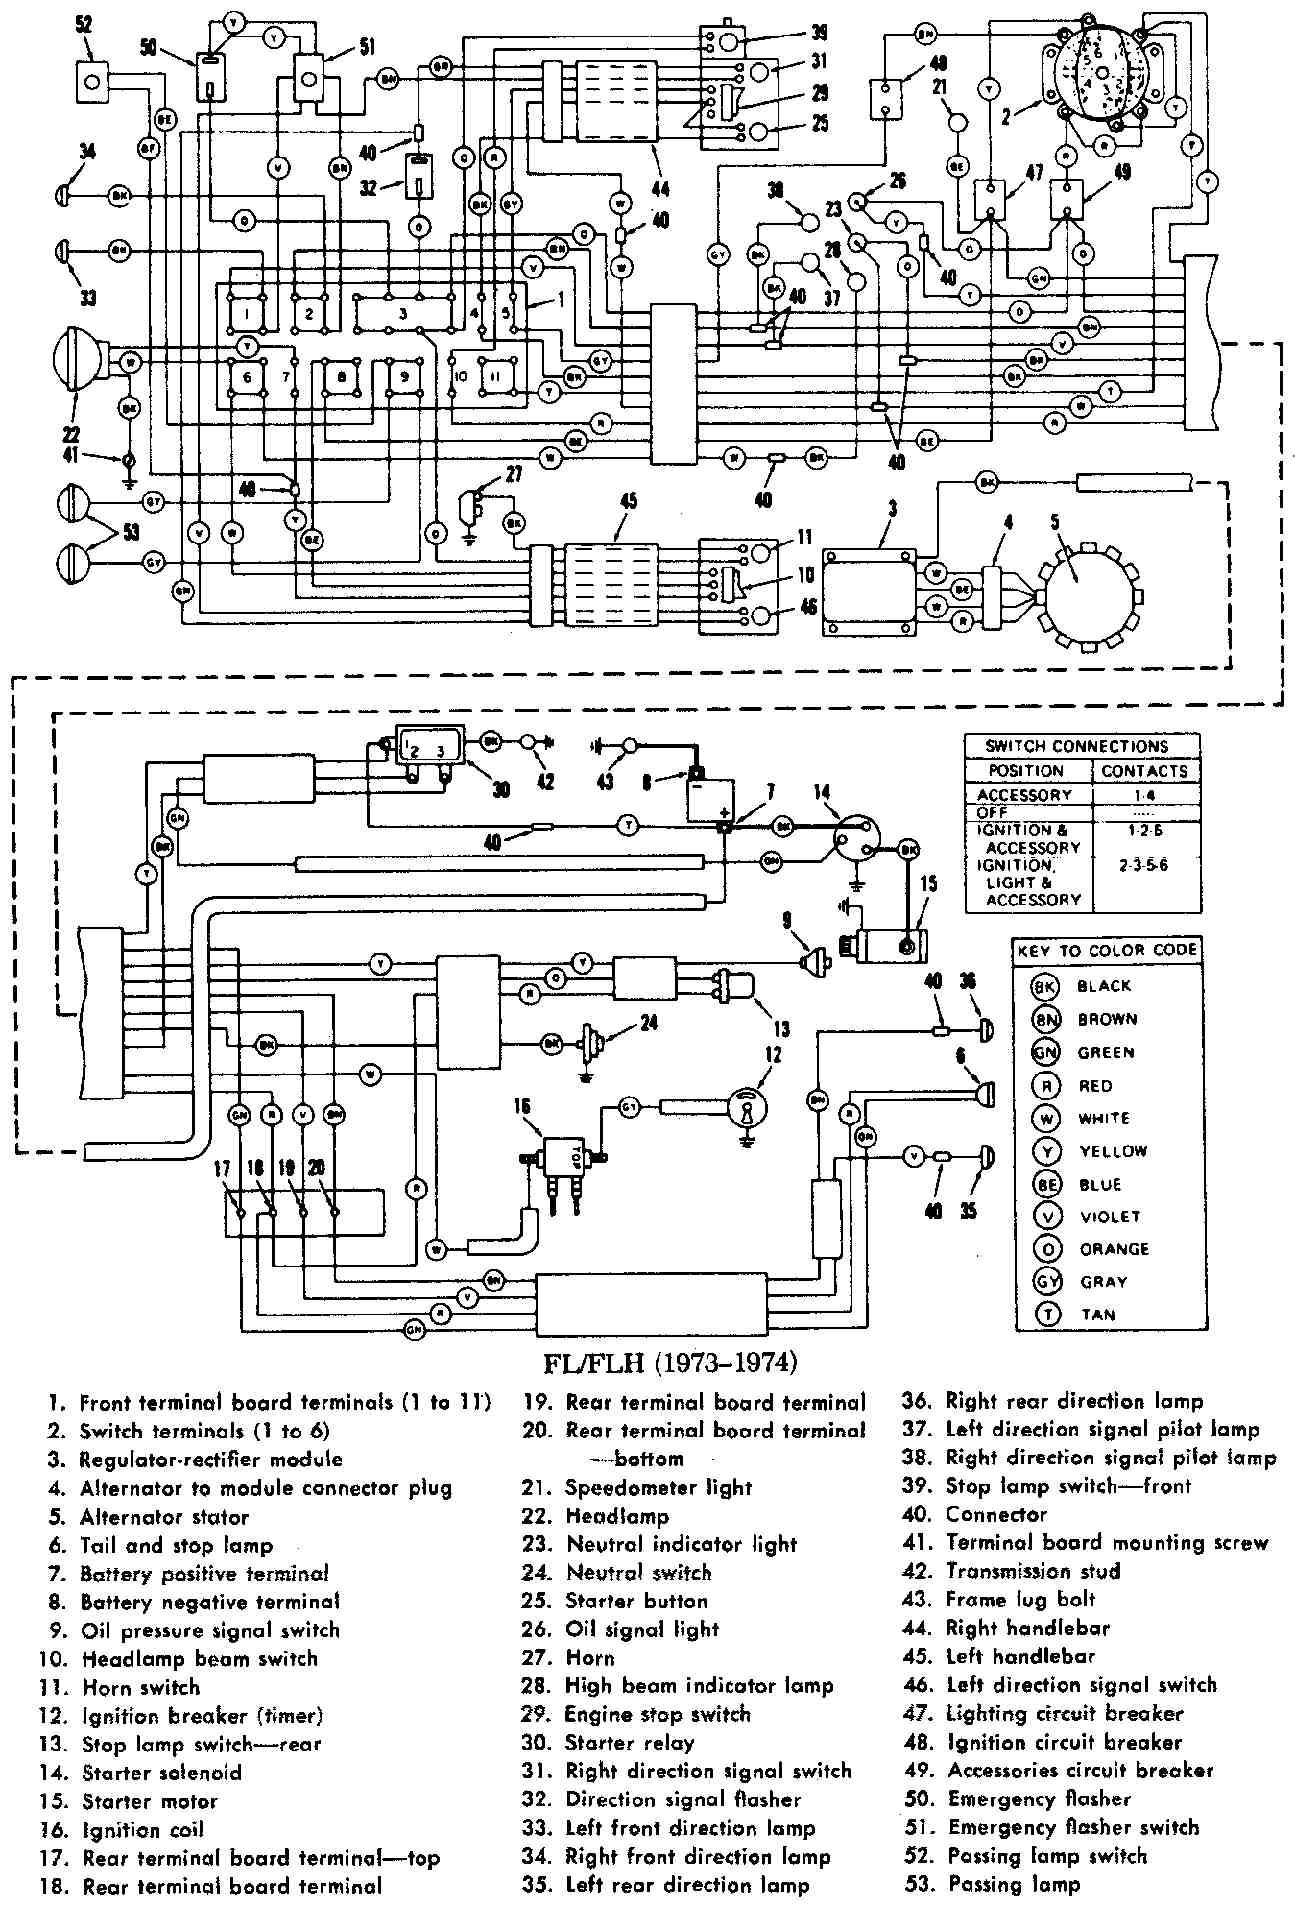 medium resolution of harley electra glide starter wiring trusted wiring diagram ford wiring diagrams flhtcui wiring diagram